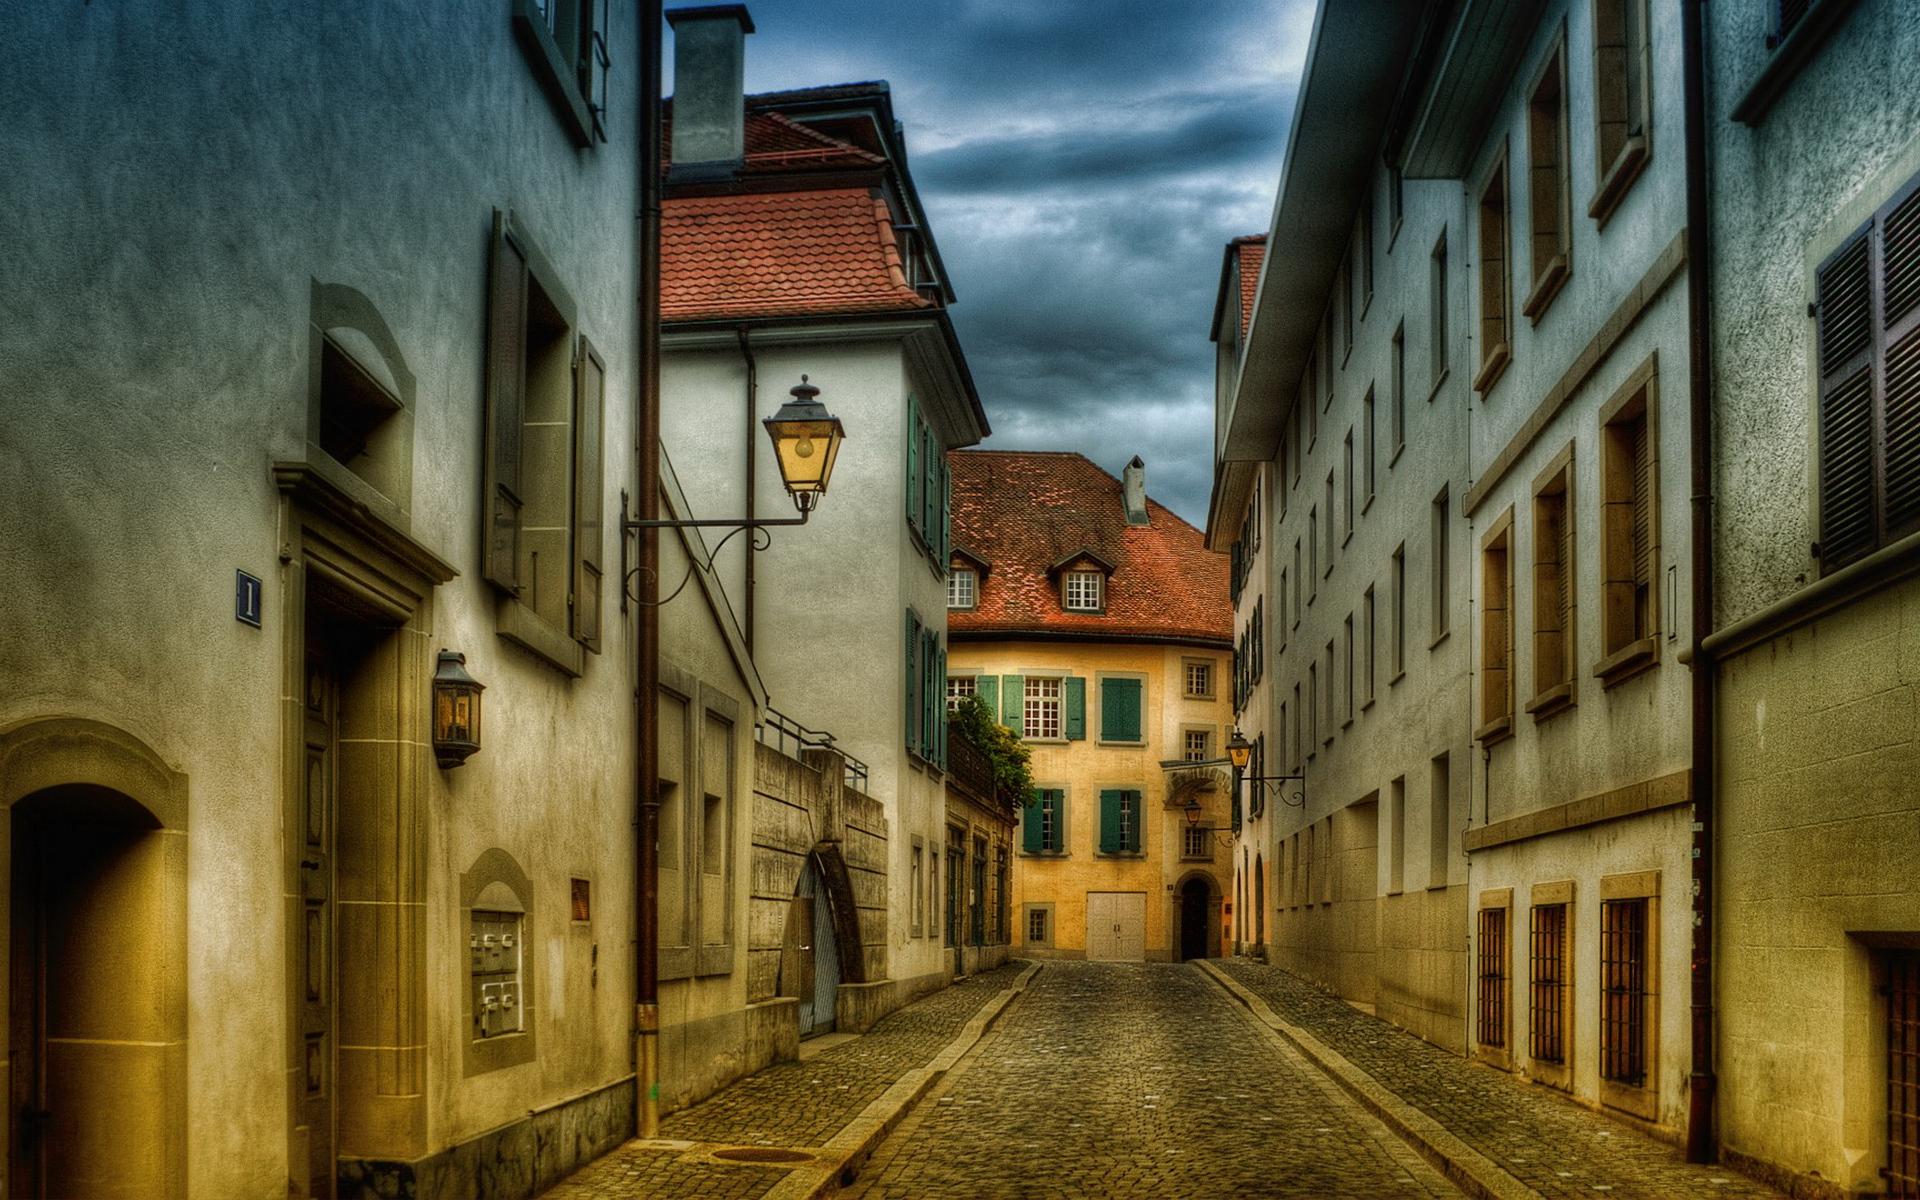 Картинка с фонарем старый город, коллеге